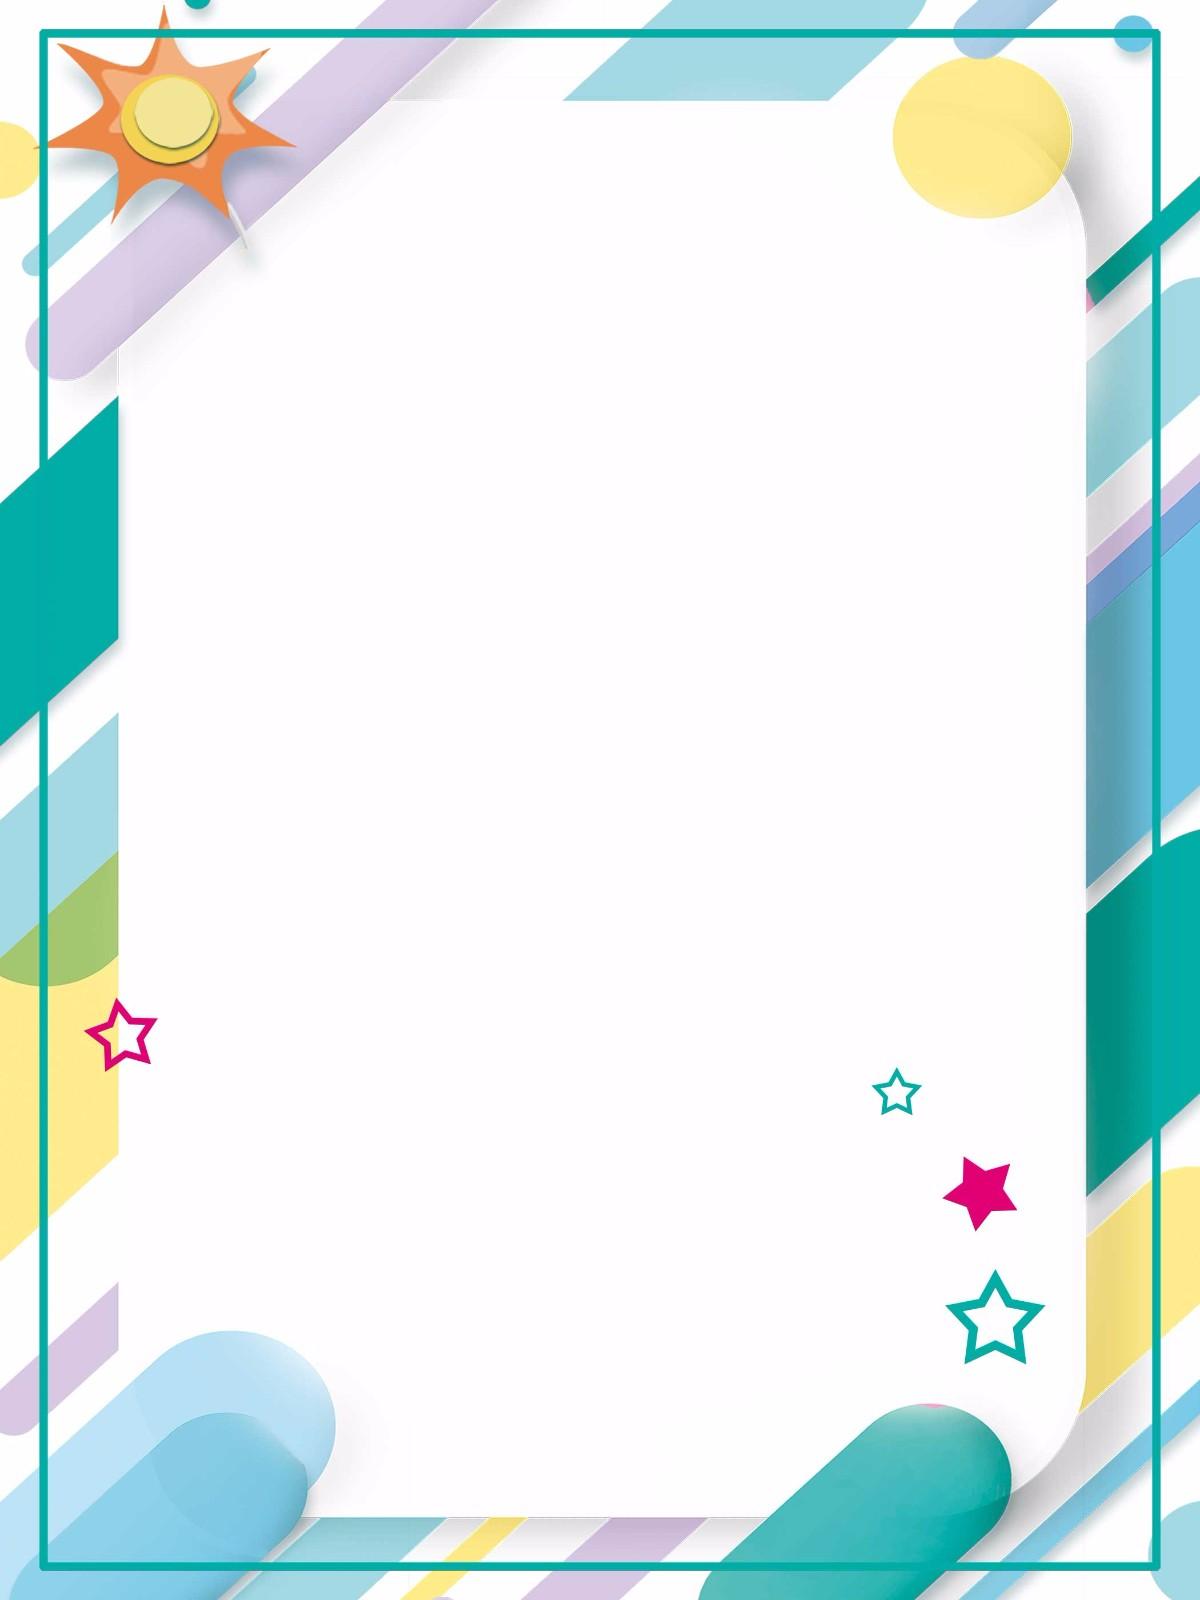 ppt 背景 背景图片 边框 模板 设计 相框 1200_1600 竖版 竖屏